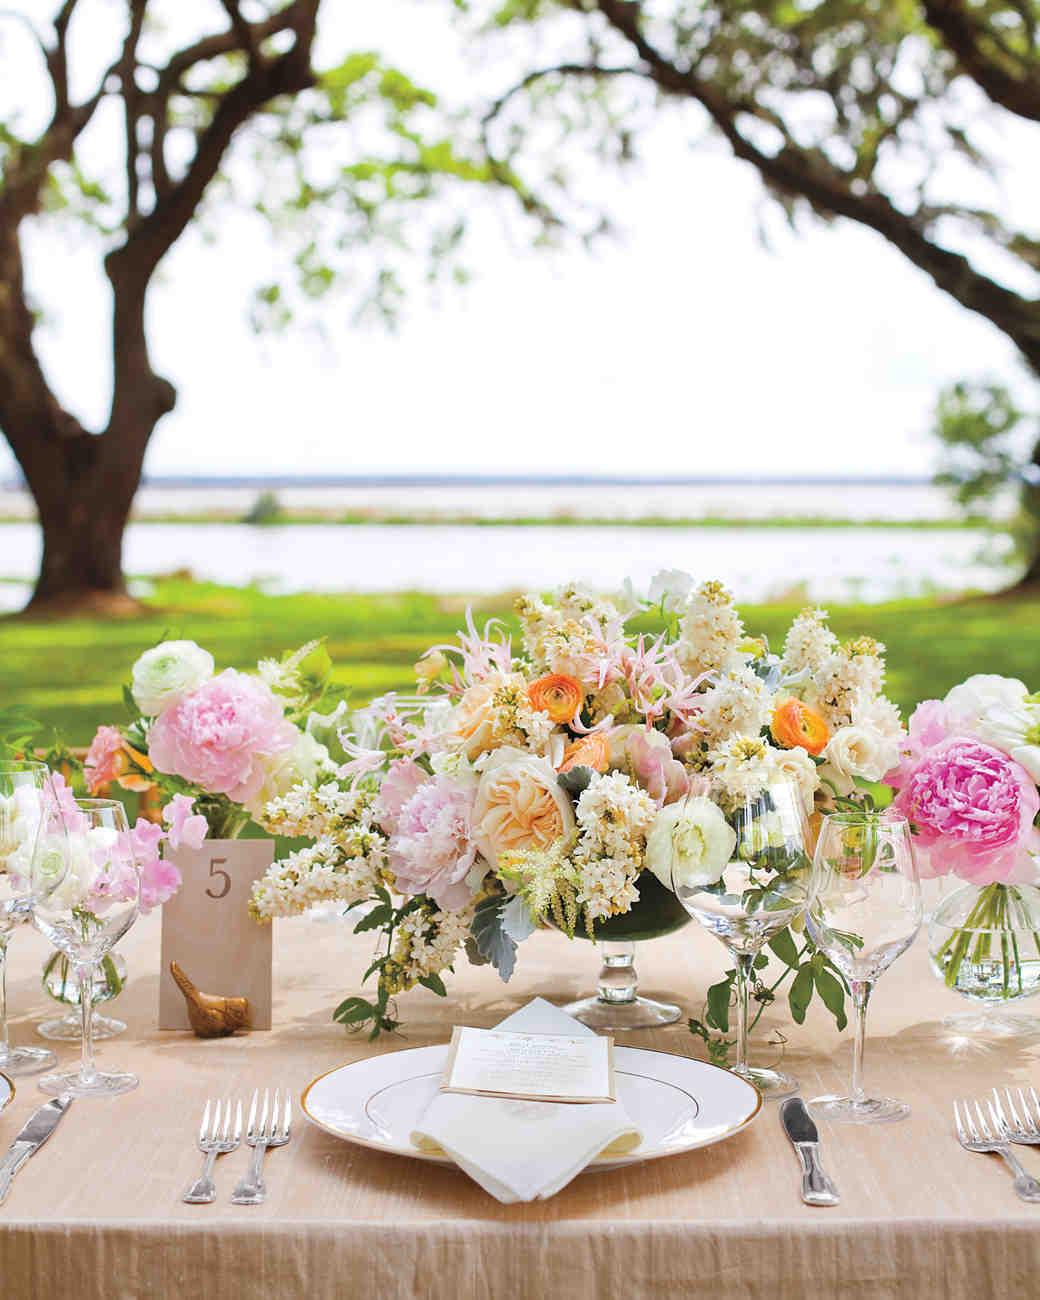 Martha Stewart Weddings: The Prettiest Peony Wedding Centerpieces